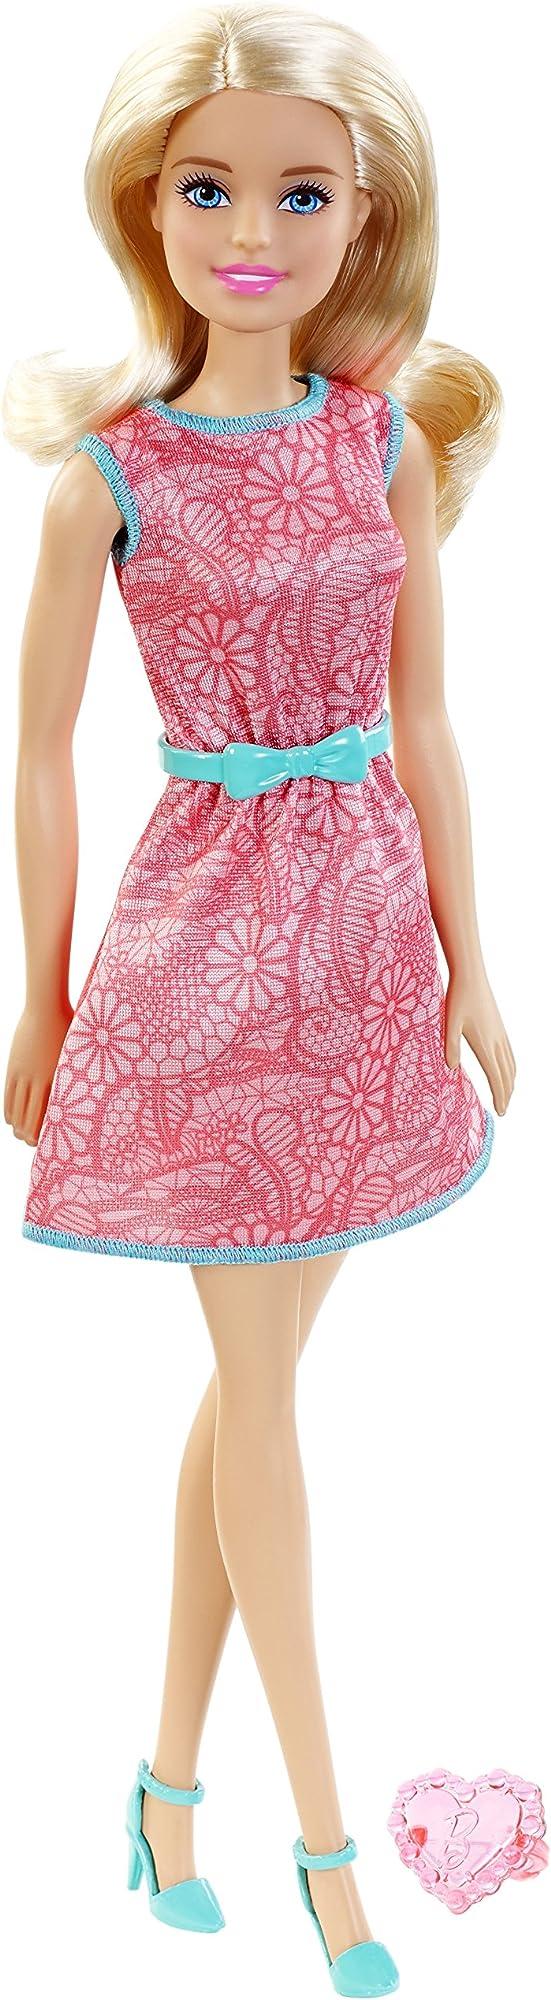 Mattel, barbie fashion & beauty doll 022476